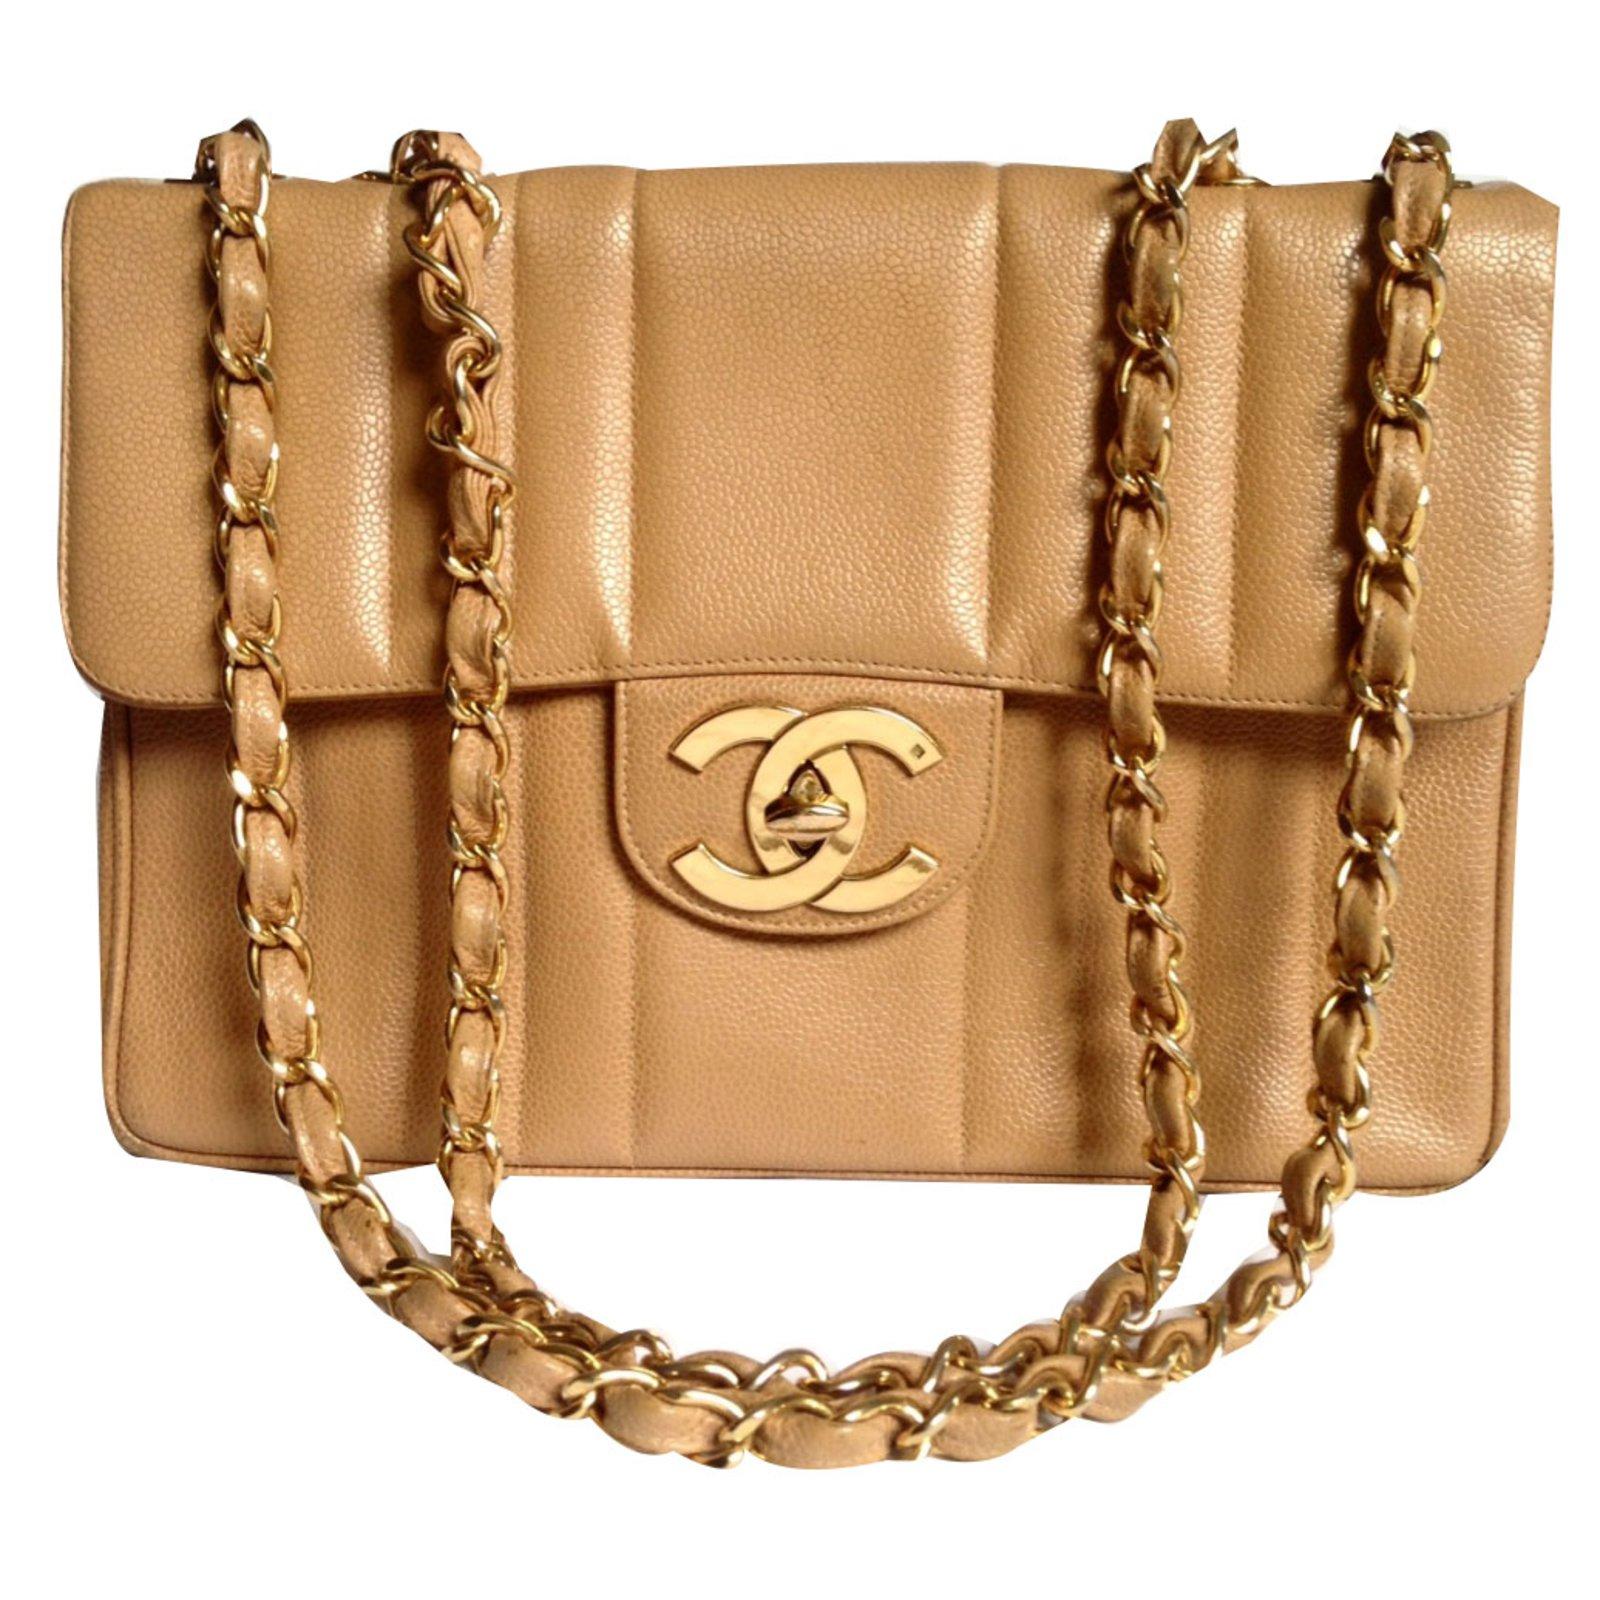 7cf38931ec373f Chanel timeless Handbags Leather Caramel ref.68115 - Joli Closet